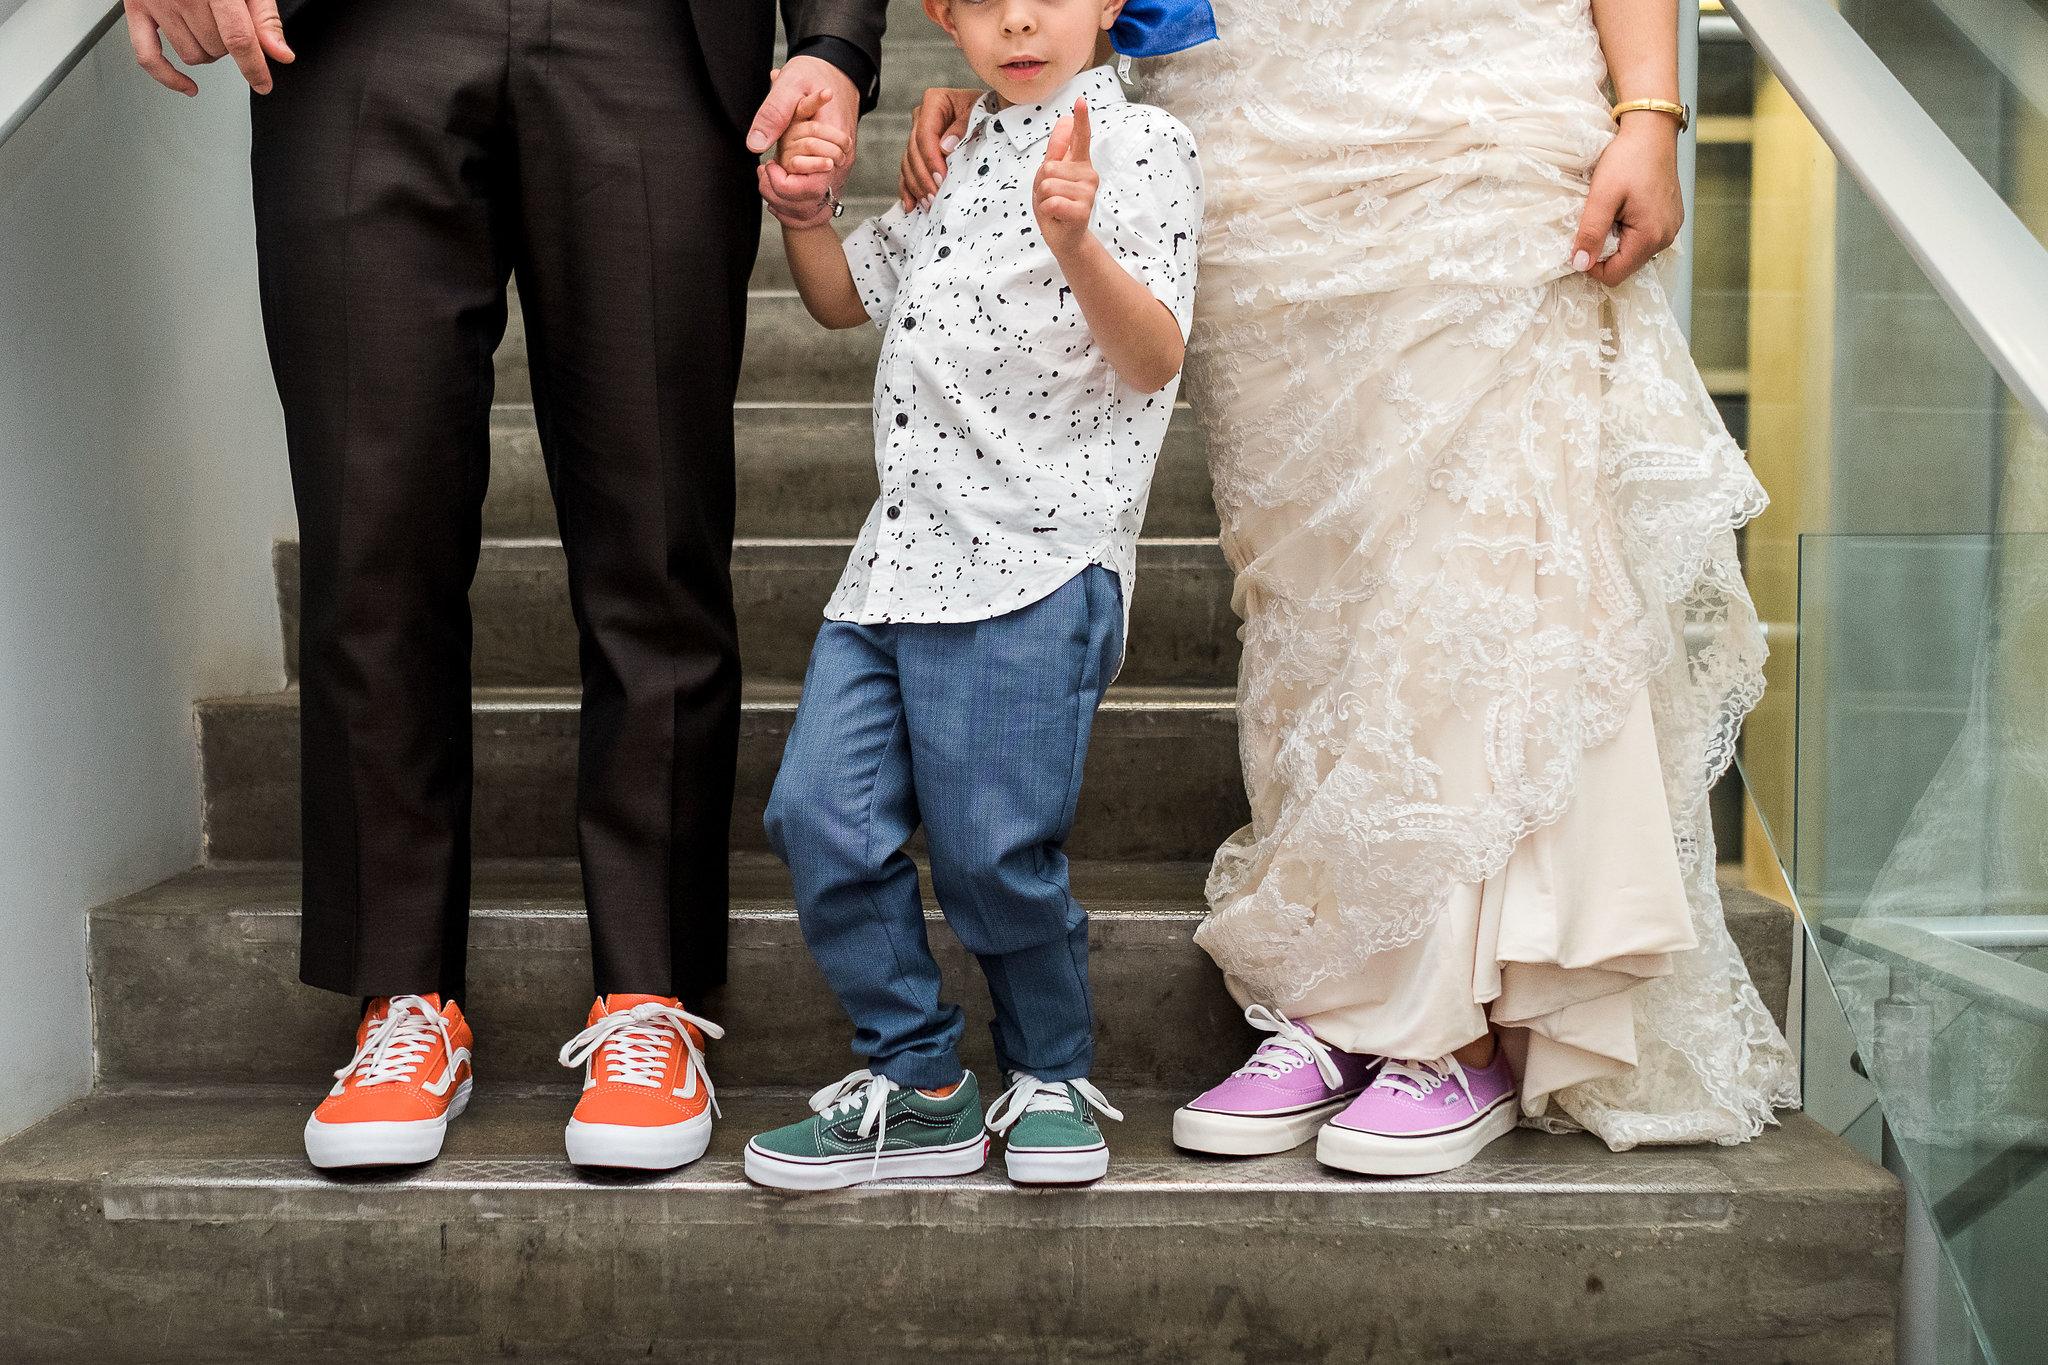 Bride and groom with vans